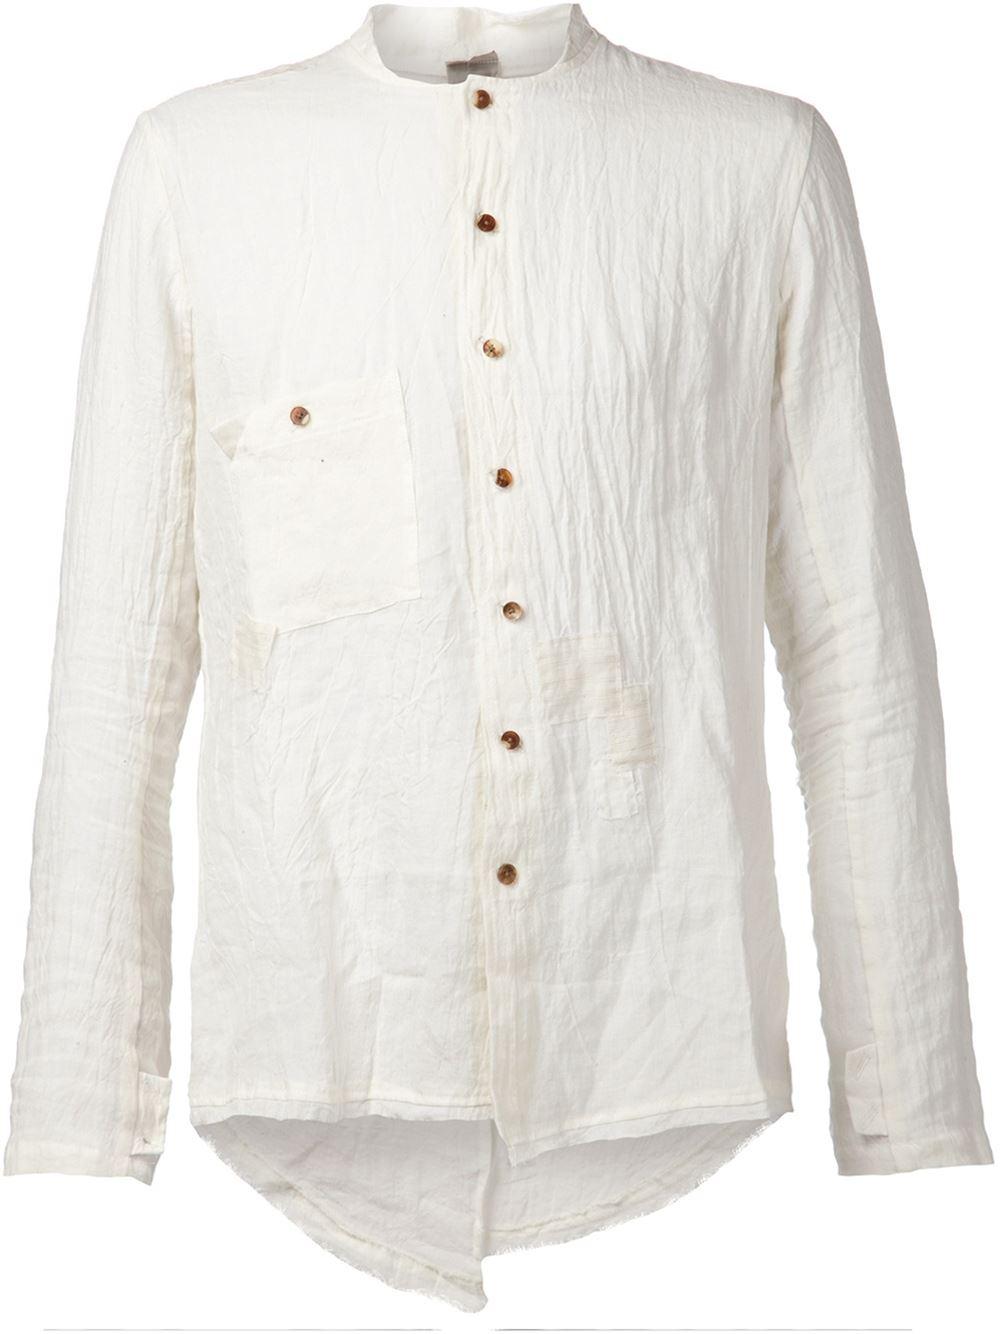 Lyst aleksandr manam s creased collarless shirt in white for Collarless white shirt slim fit